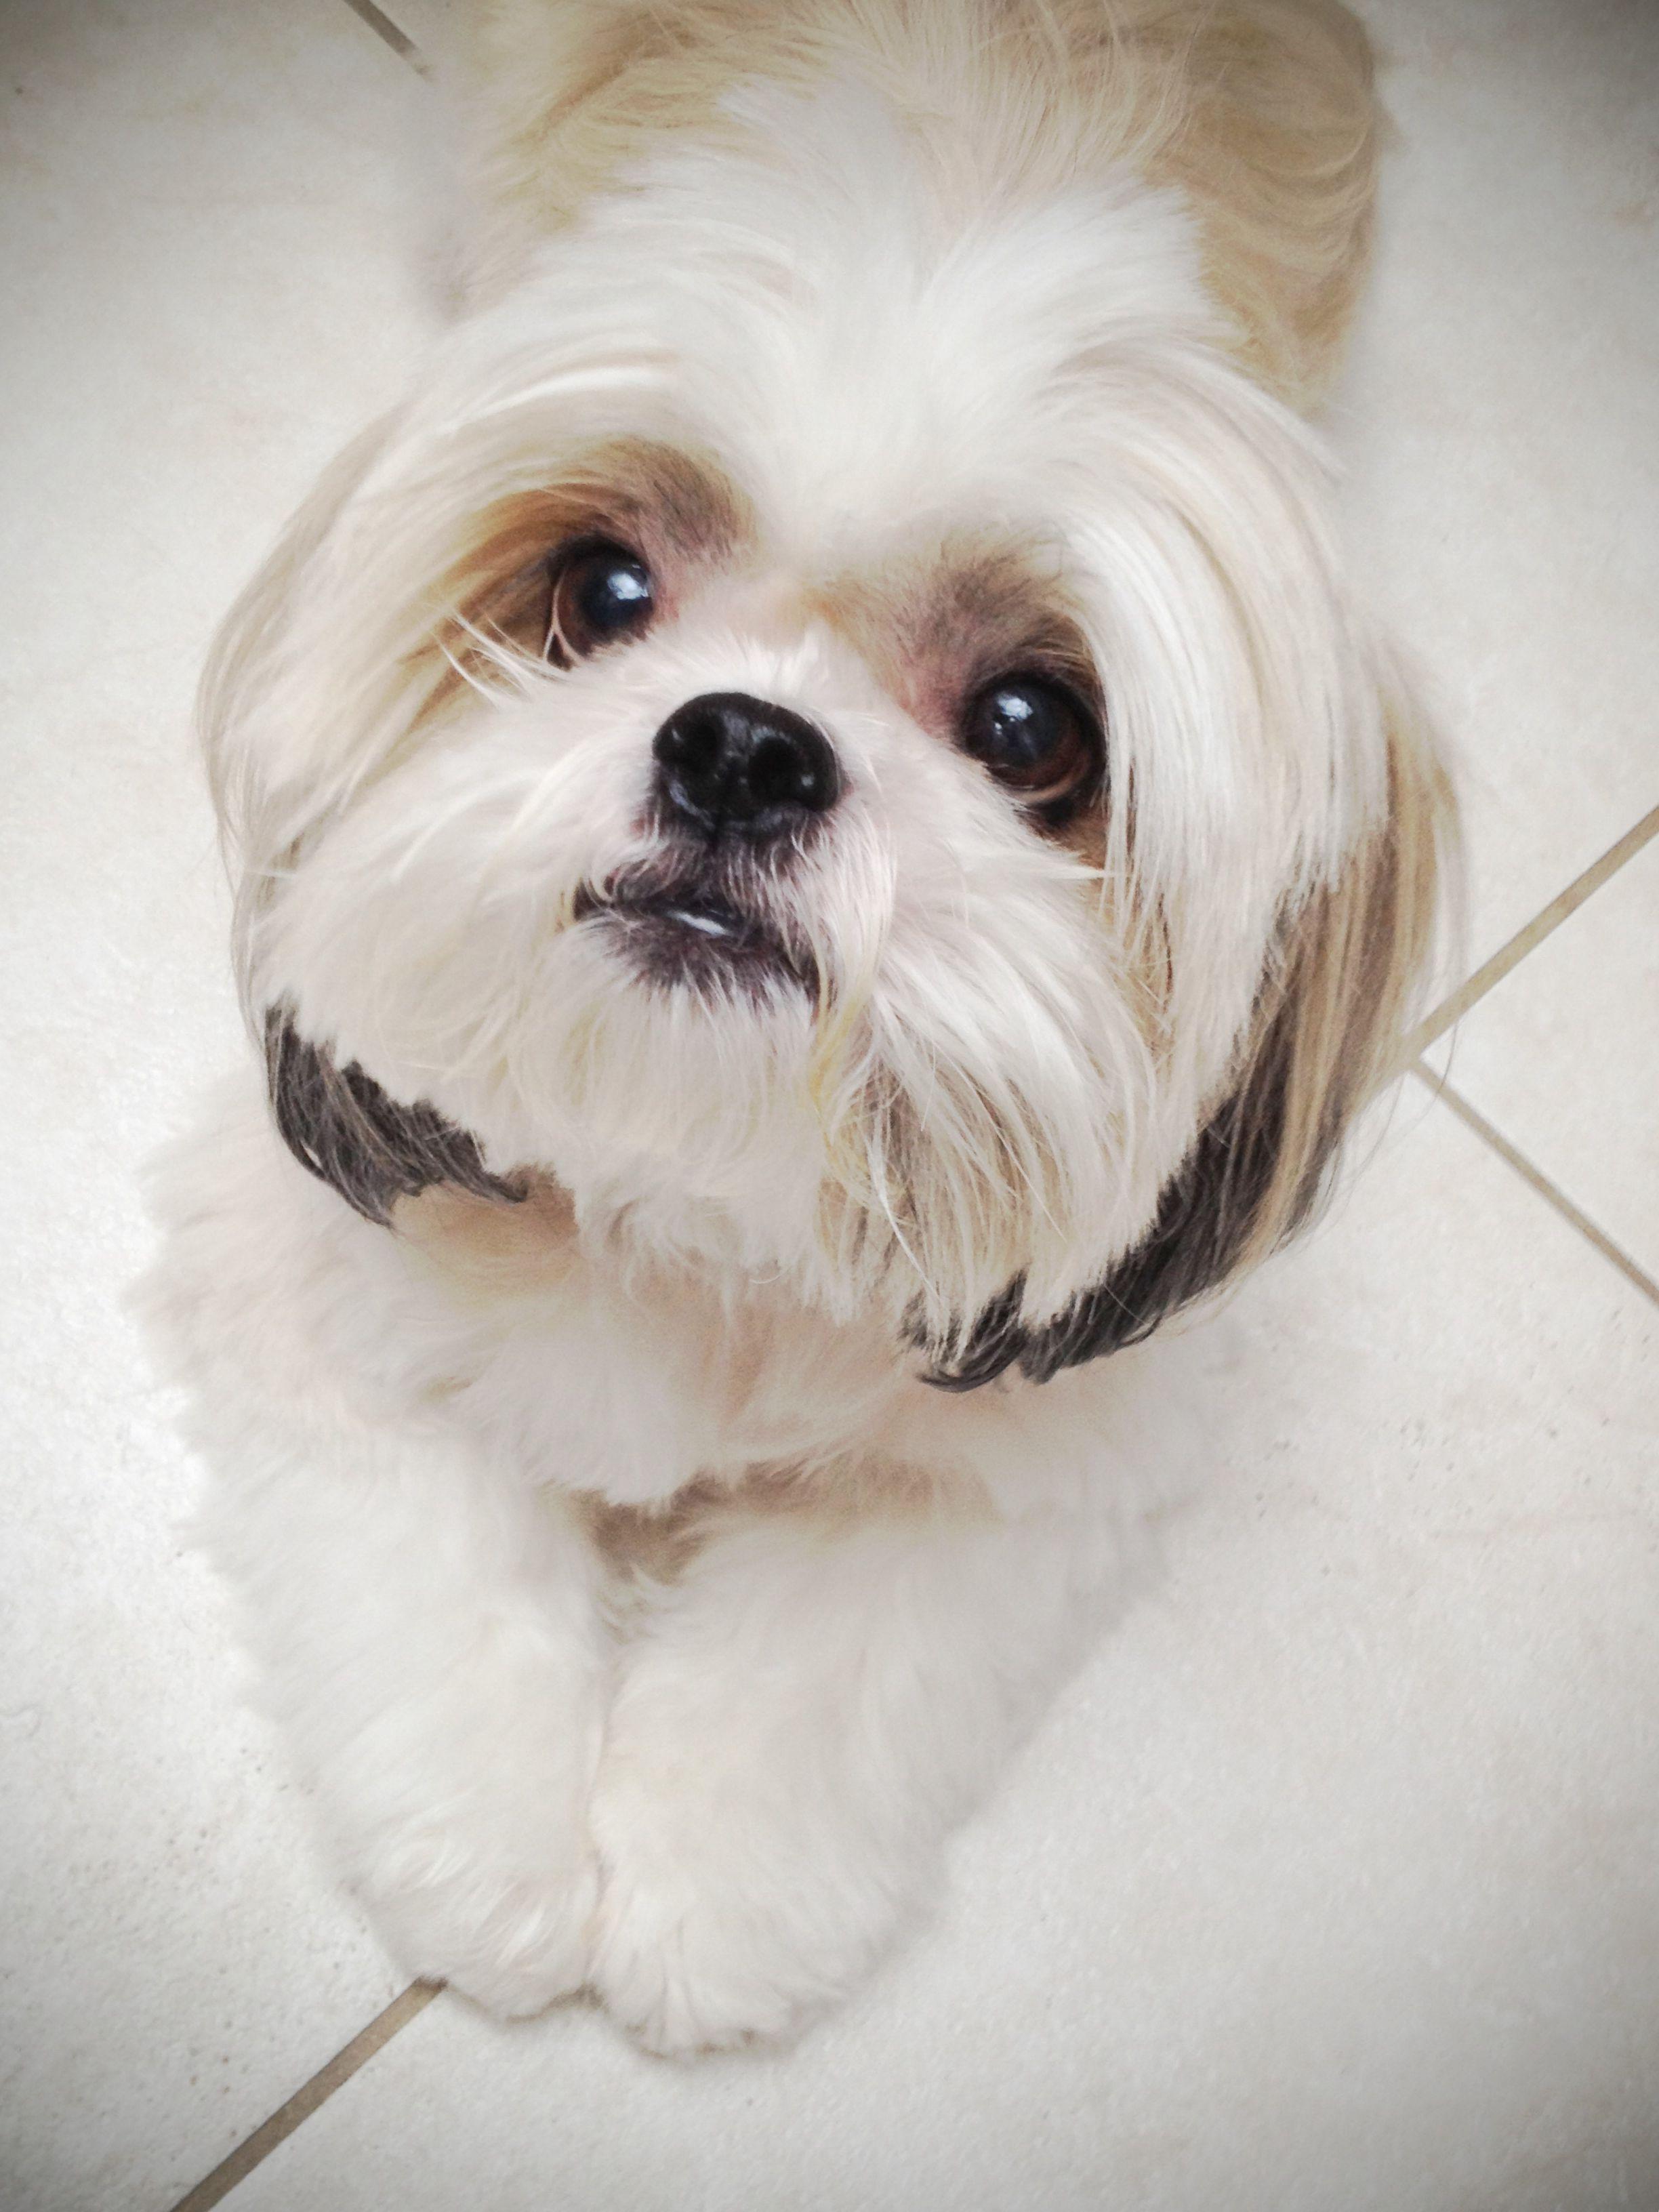 70 Shih Tzu Criado Exclusivamente Para Ser Un Perro De Compania El Shih Tzu Dog Breeds That Dont Shed Shih Tzu Dogs